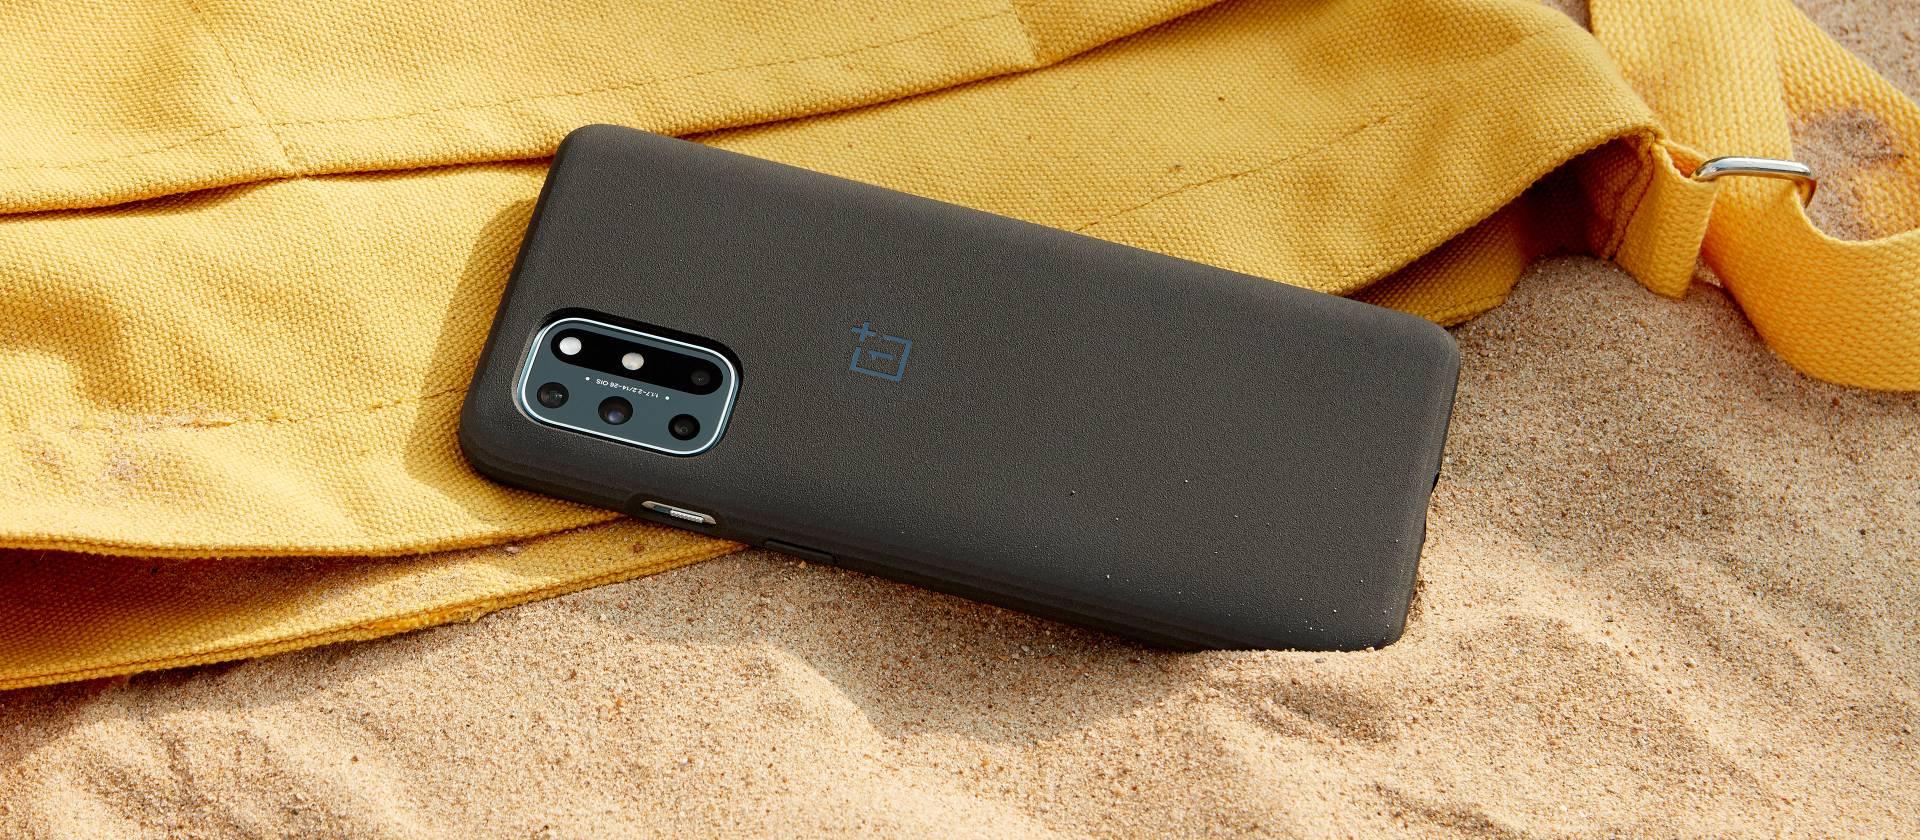 OnePlus_8T_Sandstone_Bumper_Case-04.jpg